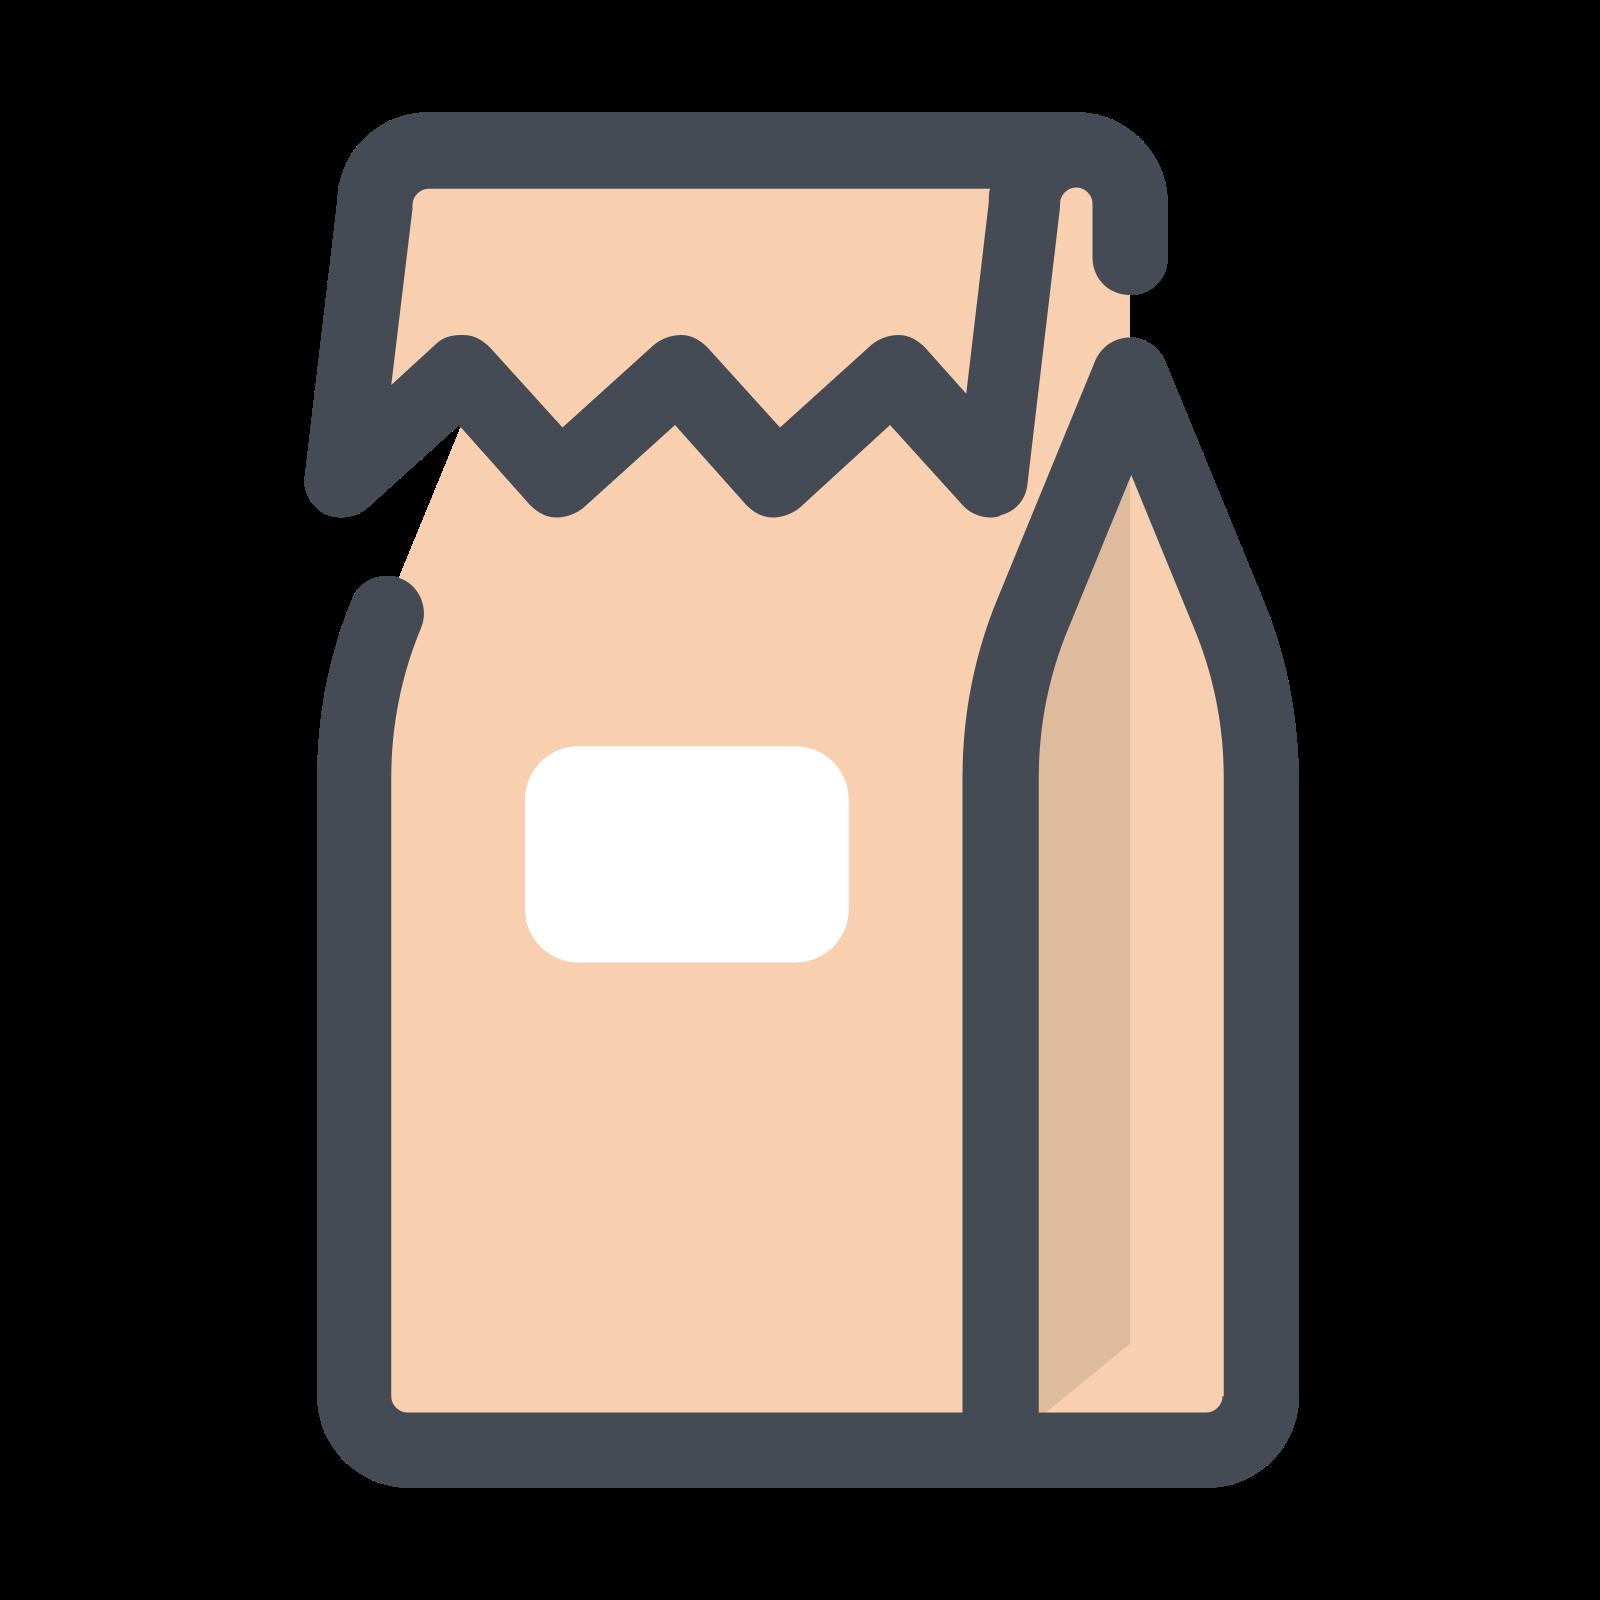 Take Away Food icon